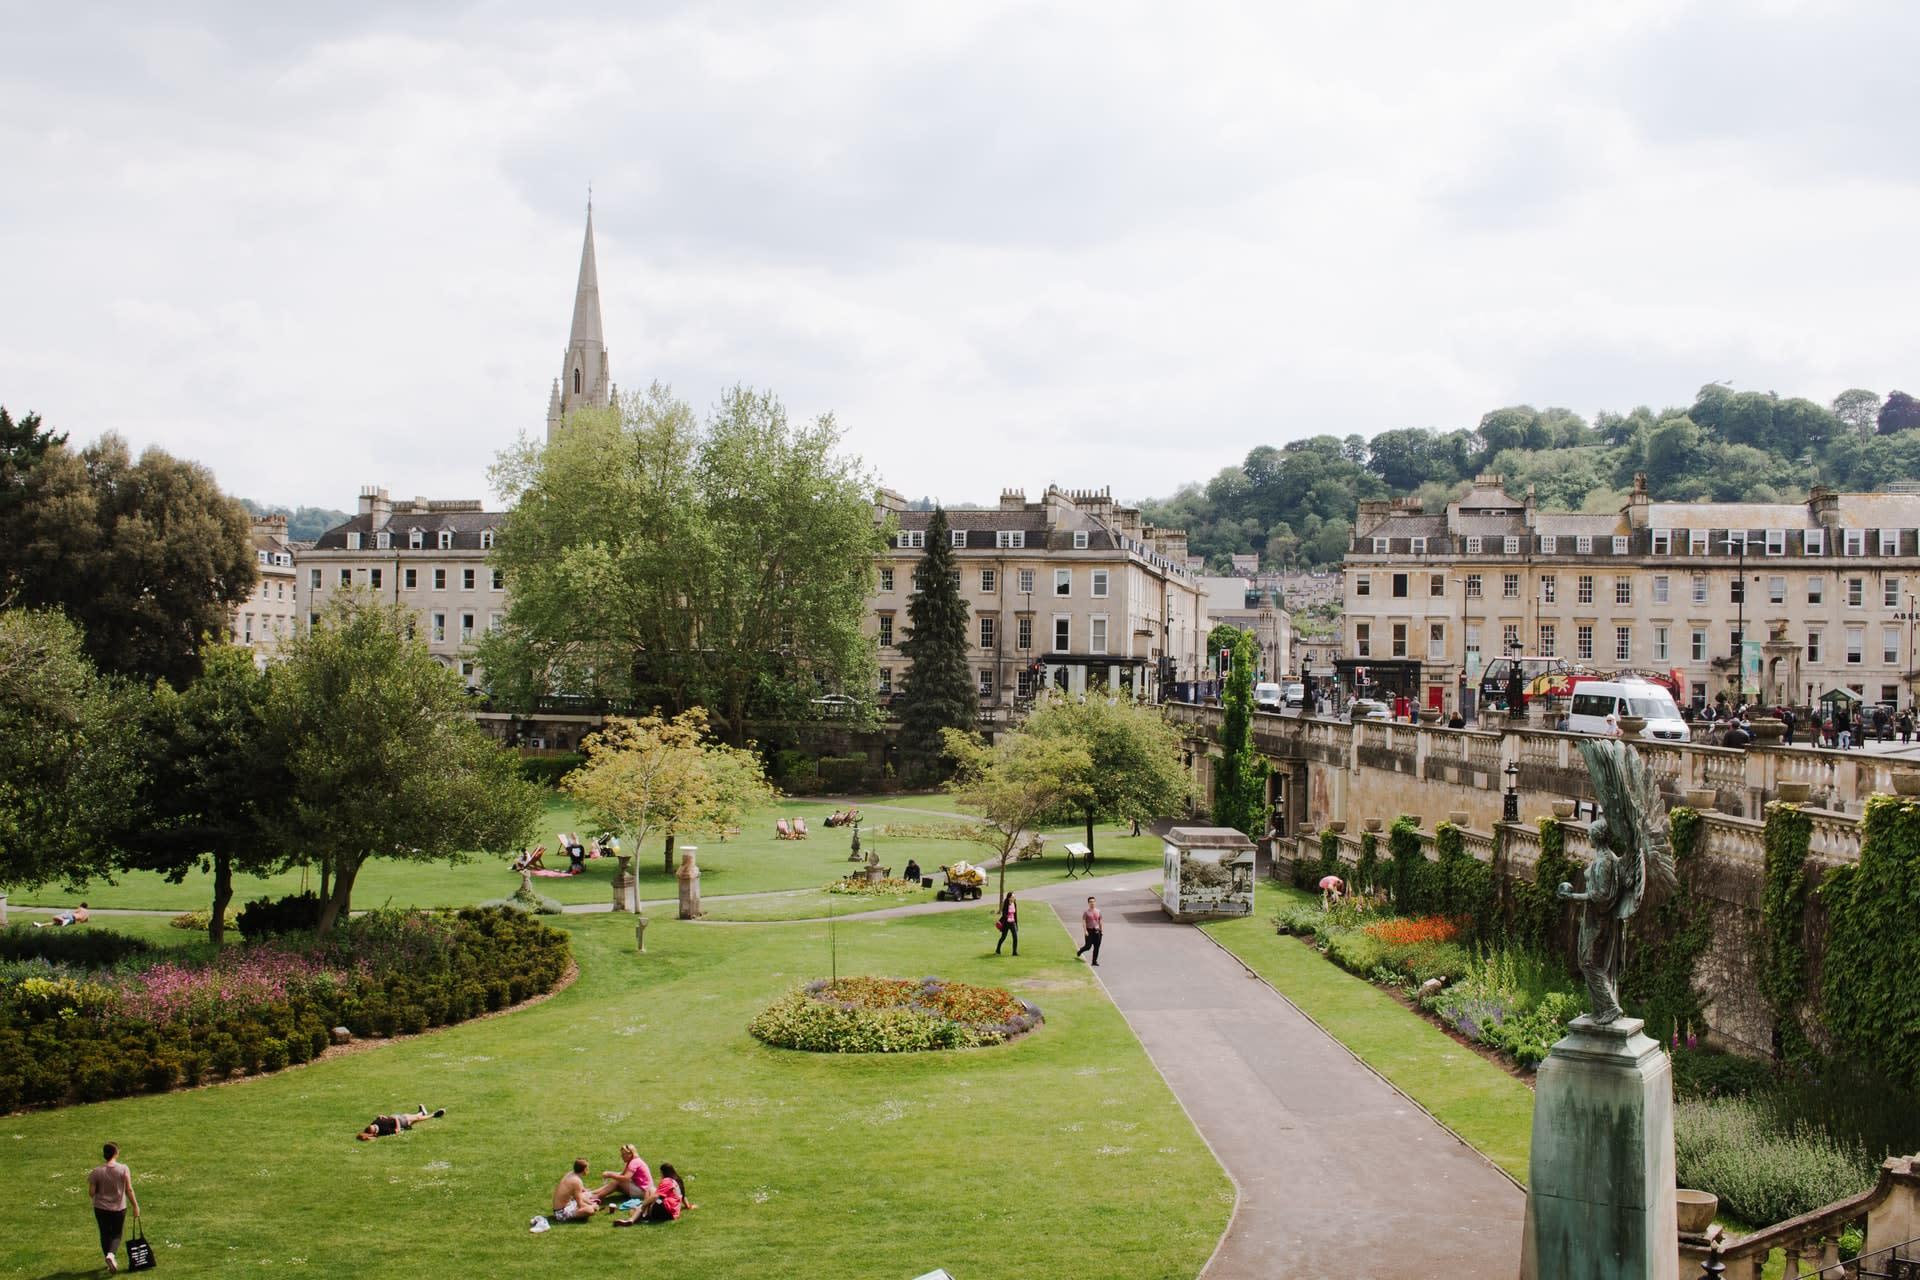 People relaxing in park in Bath